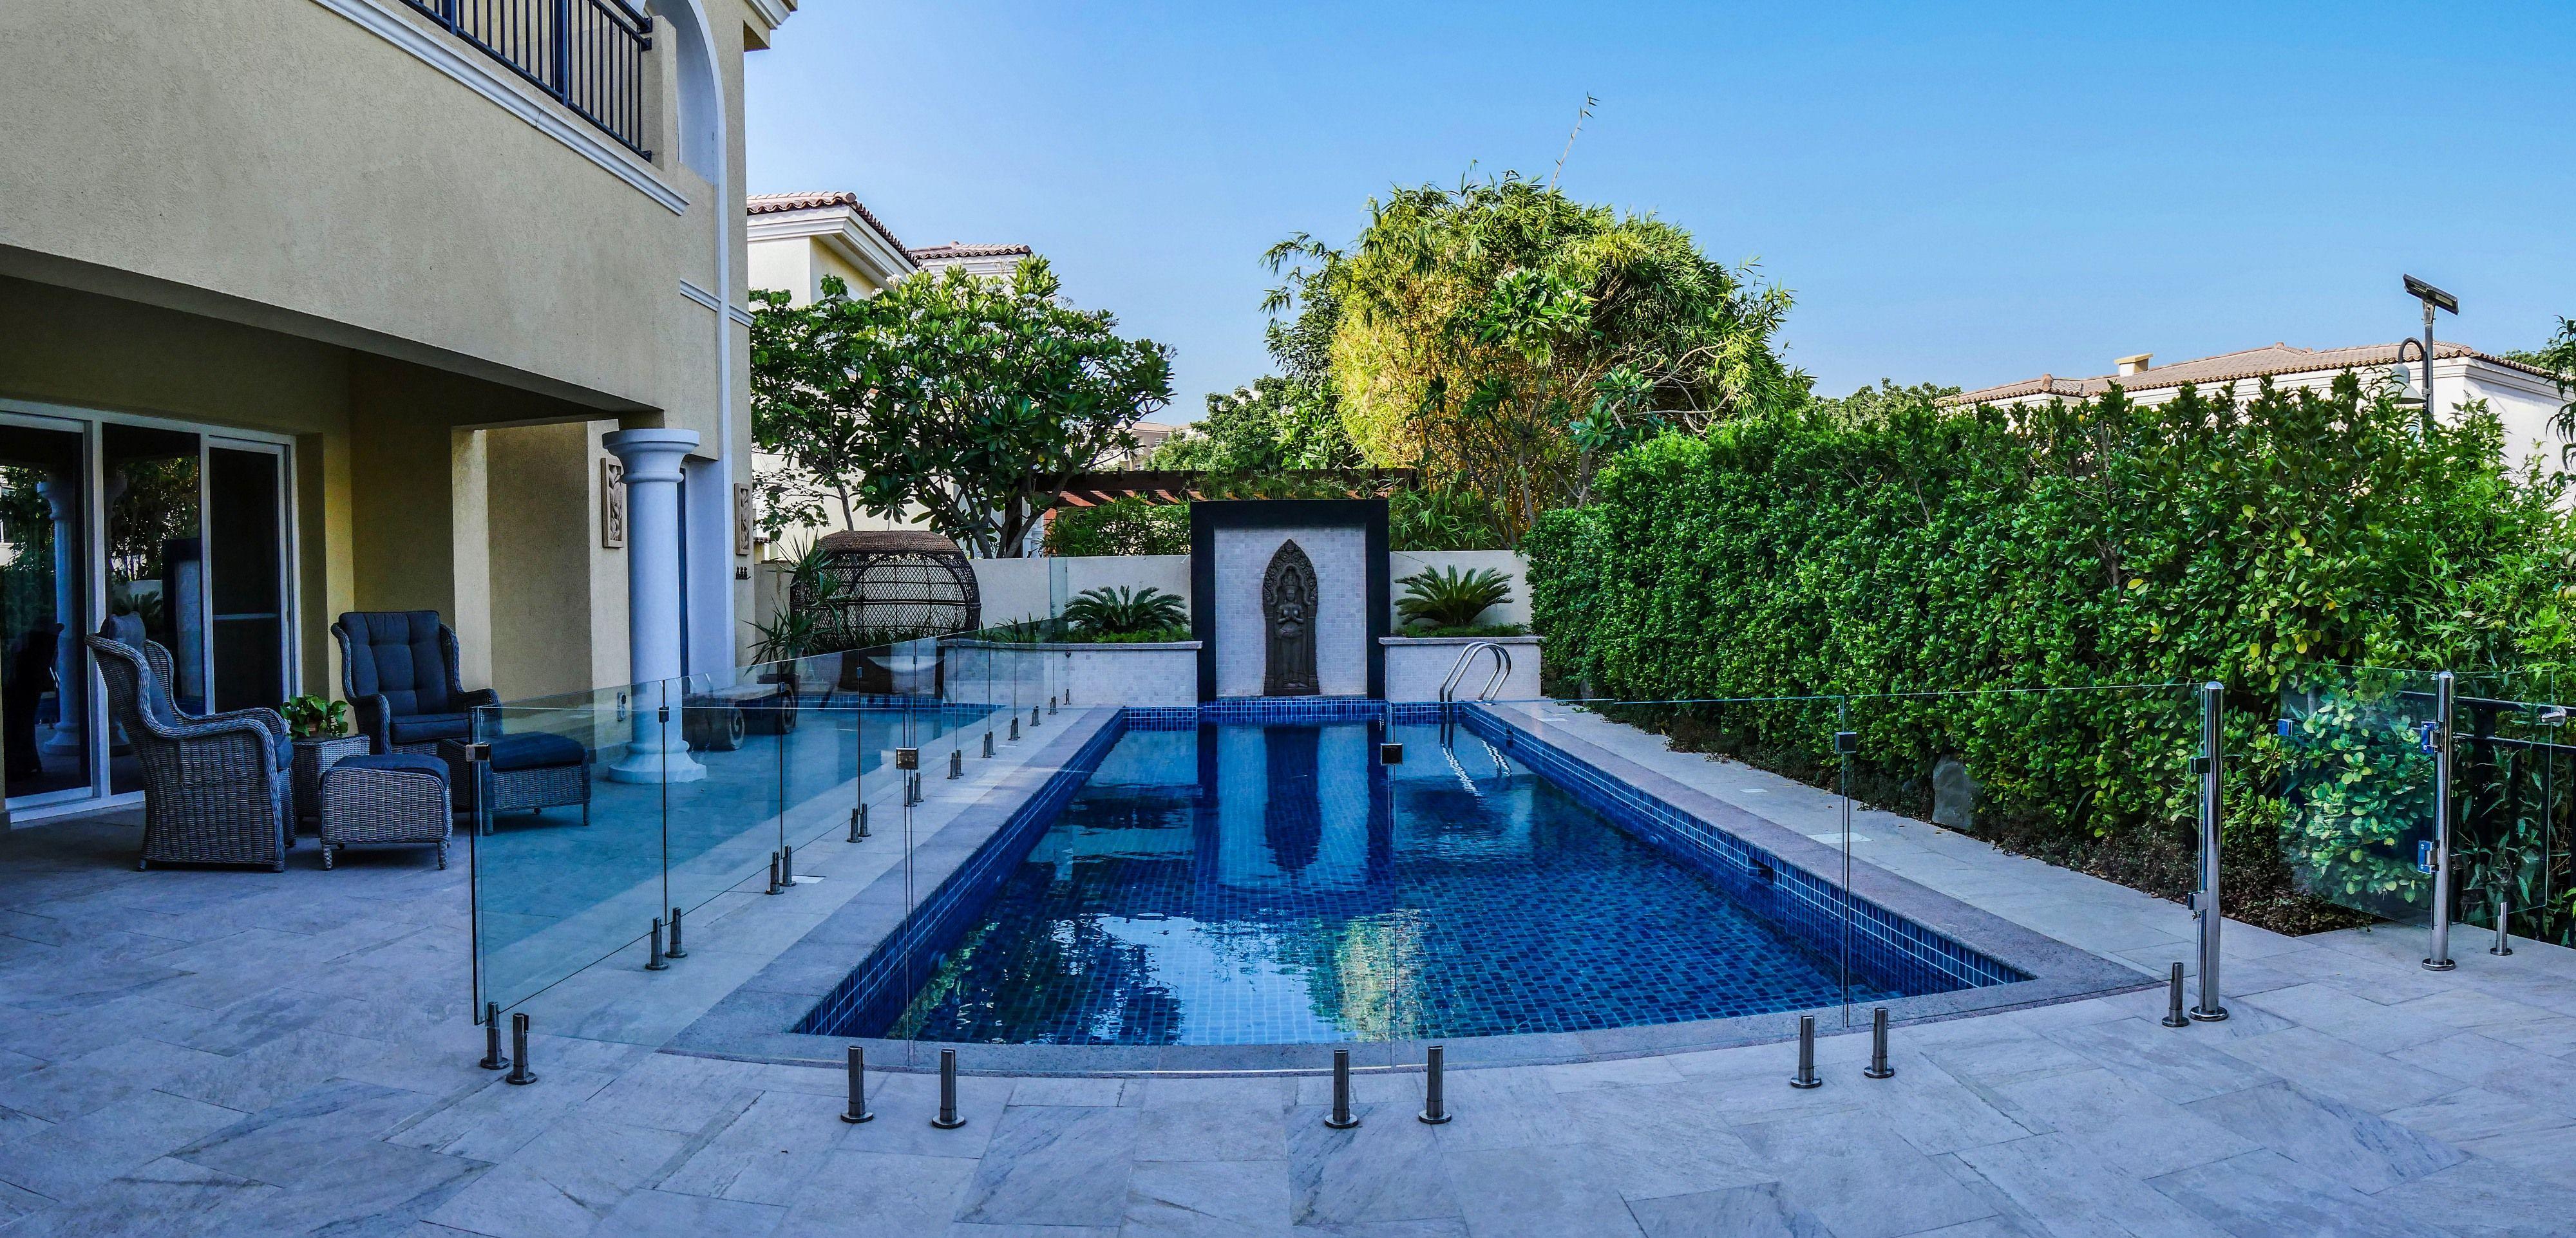 Swimming Pool Swimming Pool Designs Dubai Garden Swimming Pool Construction